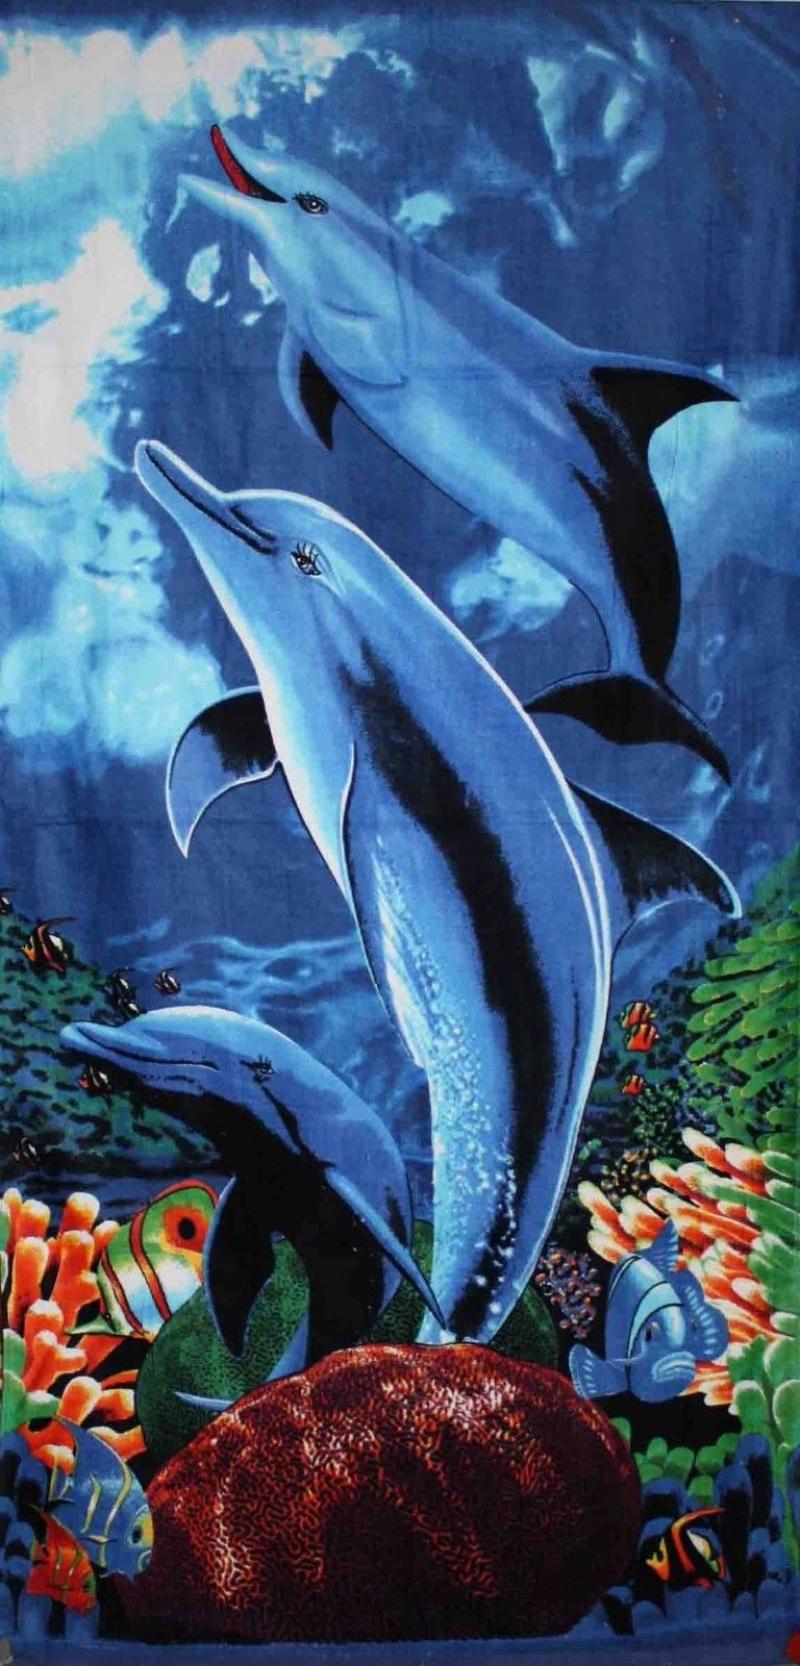 Strandtuch Badetuch Motiv Delphin